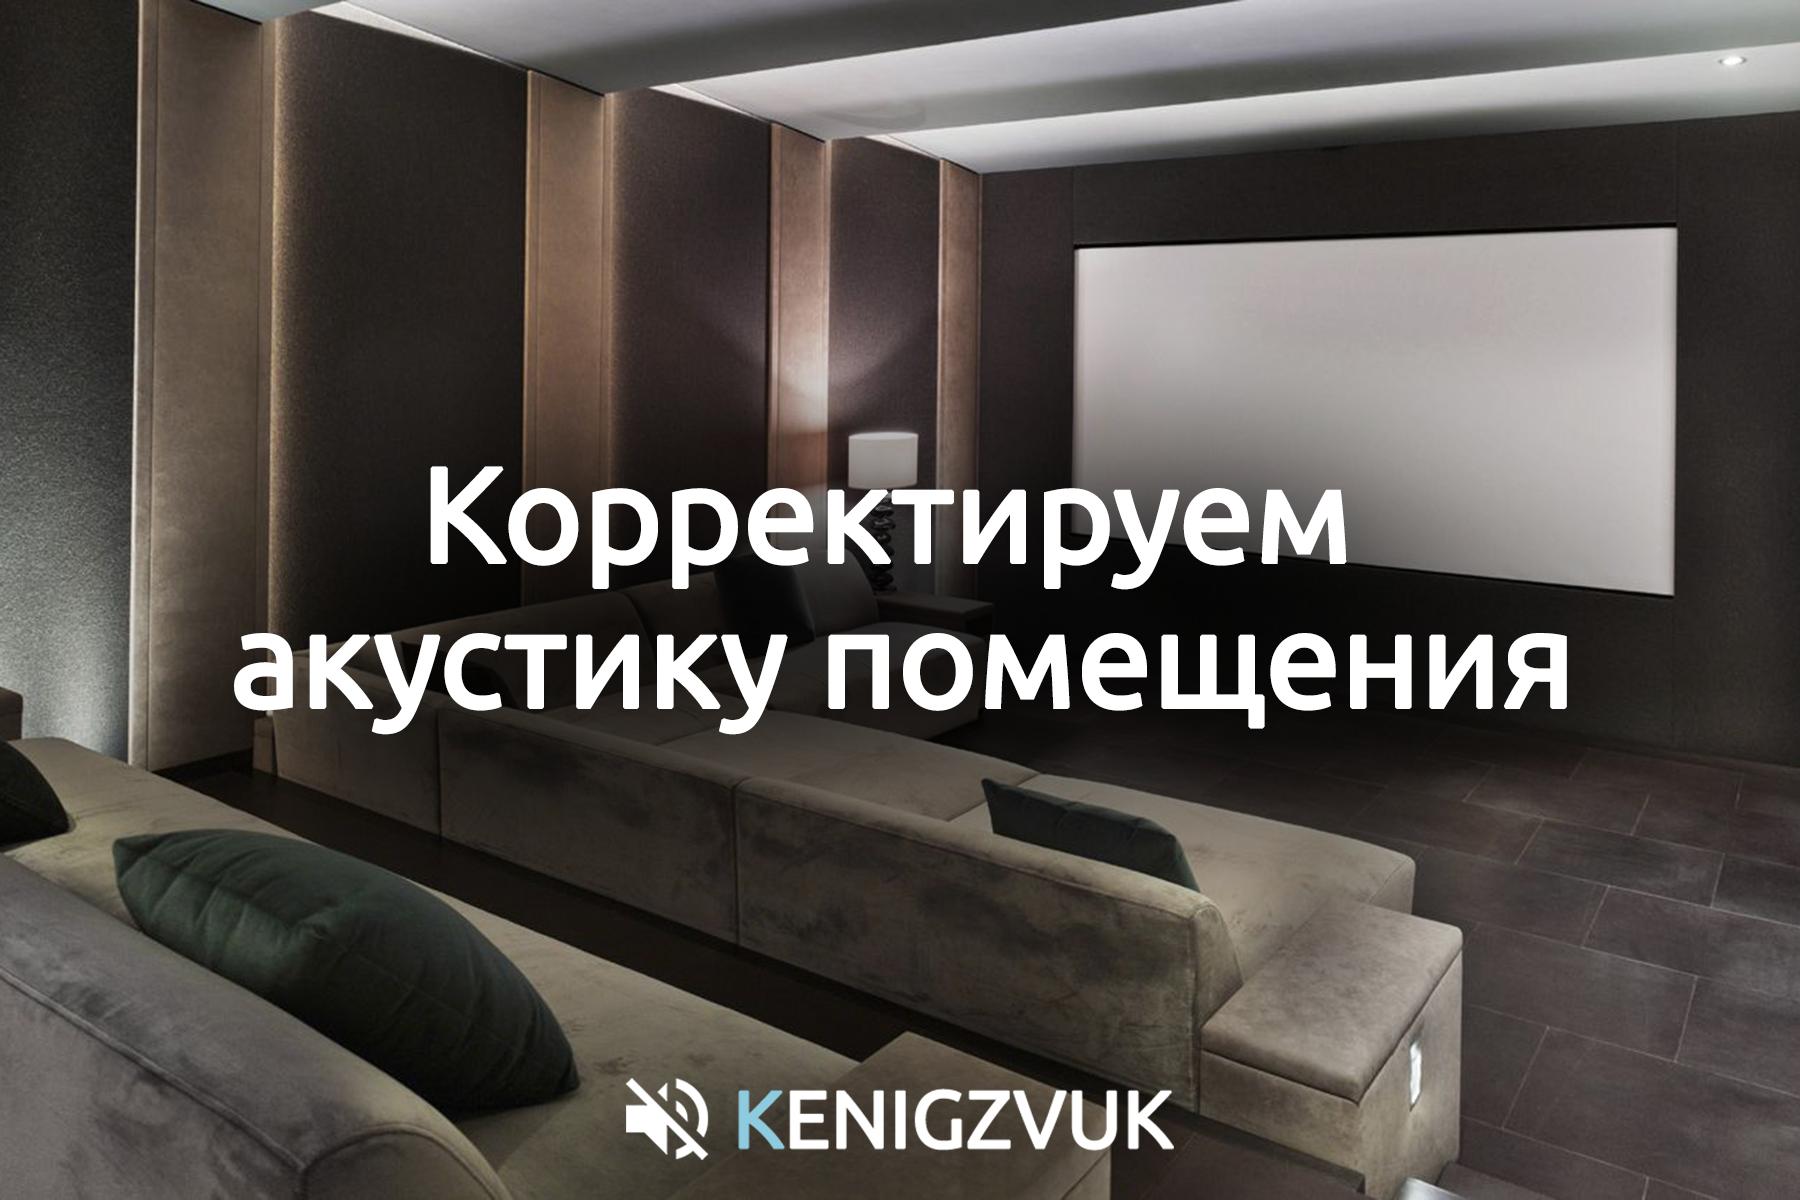 KenigZvuk   Звукоизоляция Калининград - Корректируем акустику помещения